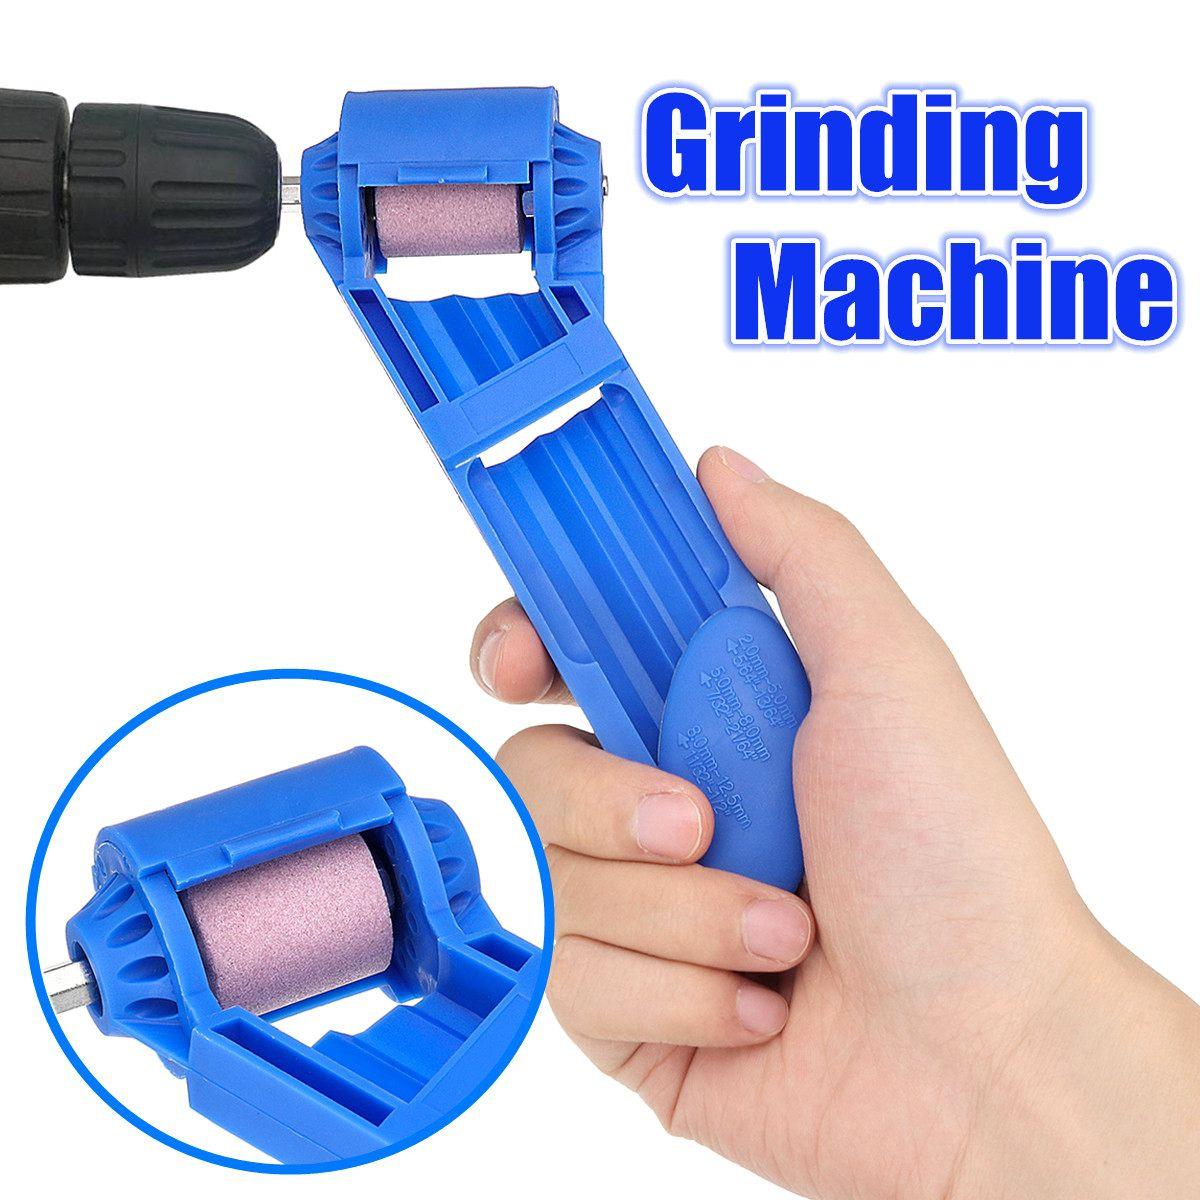 Portable 2 12.5mm Grinding Wheel Drilling Machine Drill Bit Sharpener Corundum ed Tool for Drill Polishing|Grinding Machine| |  - title=